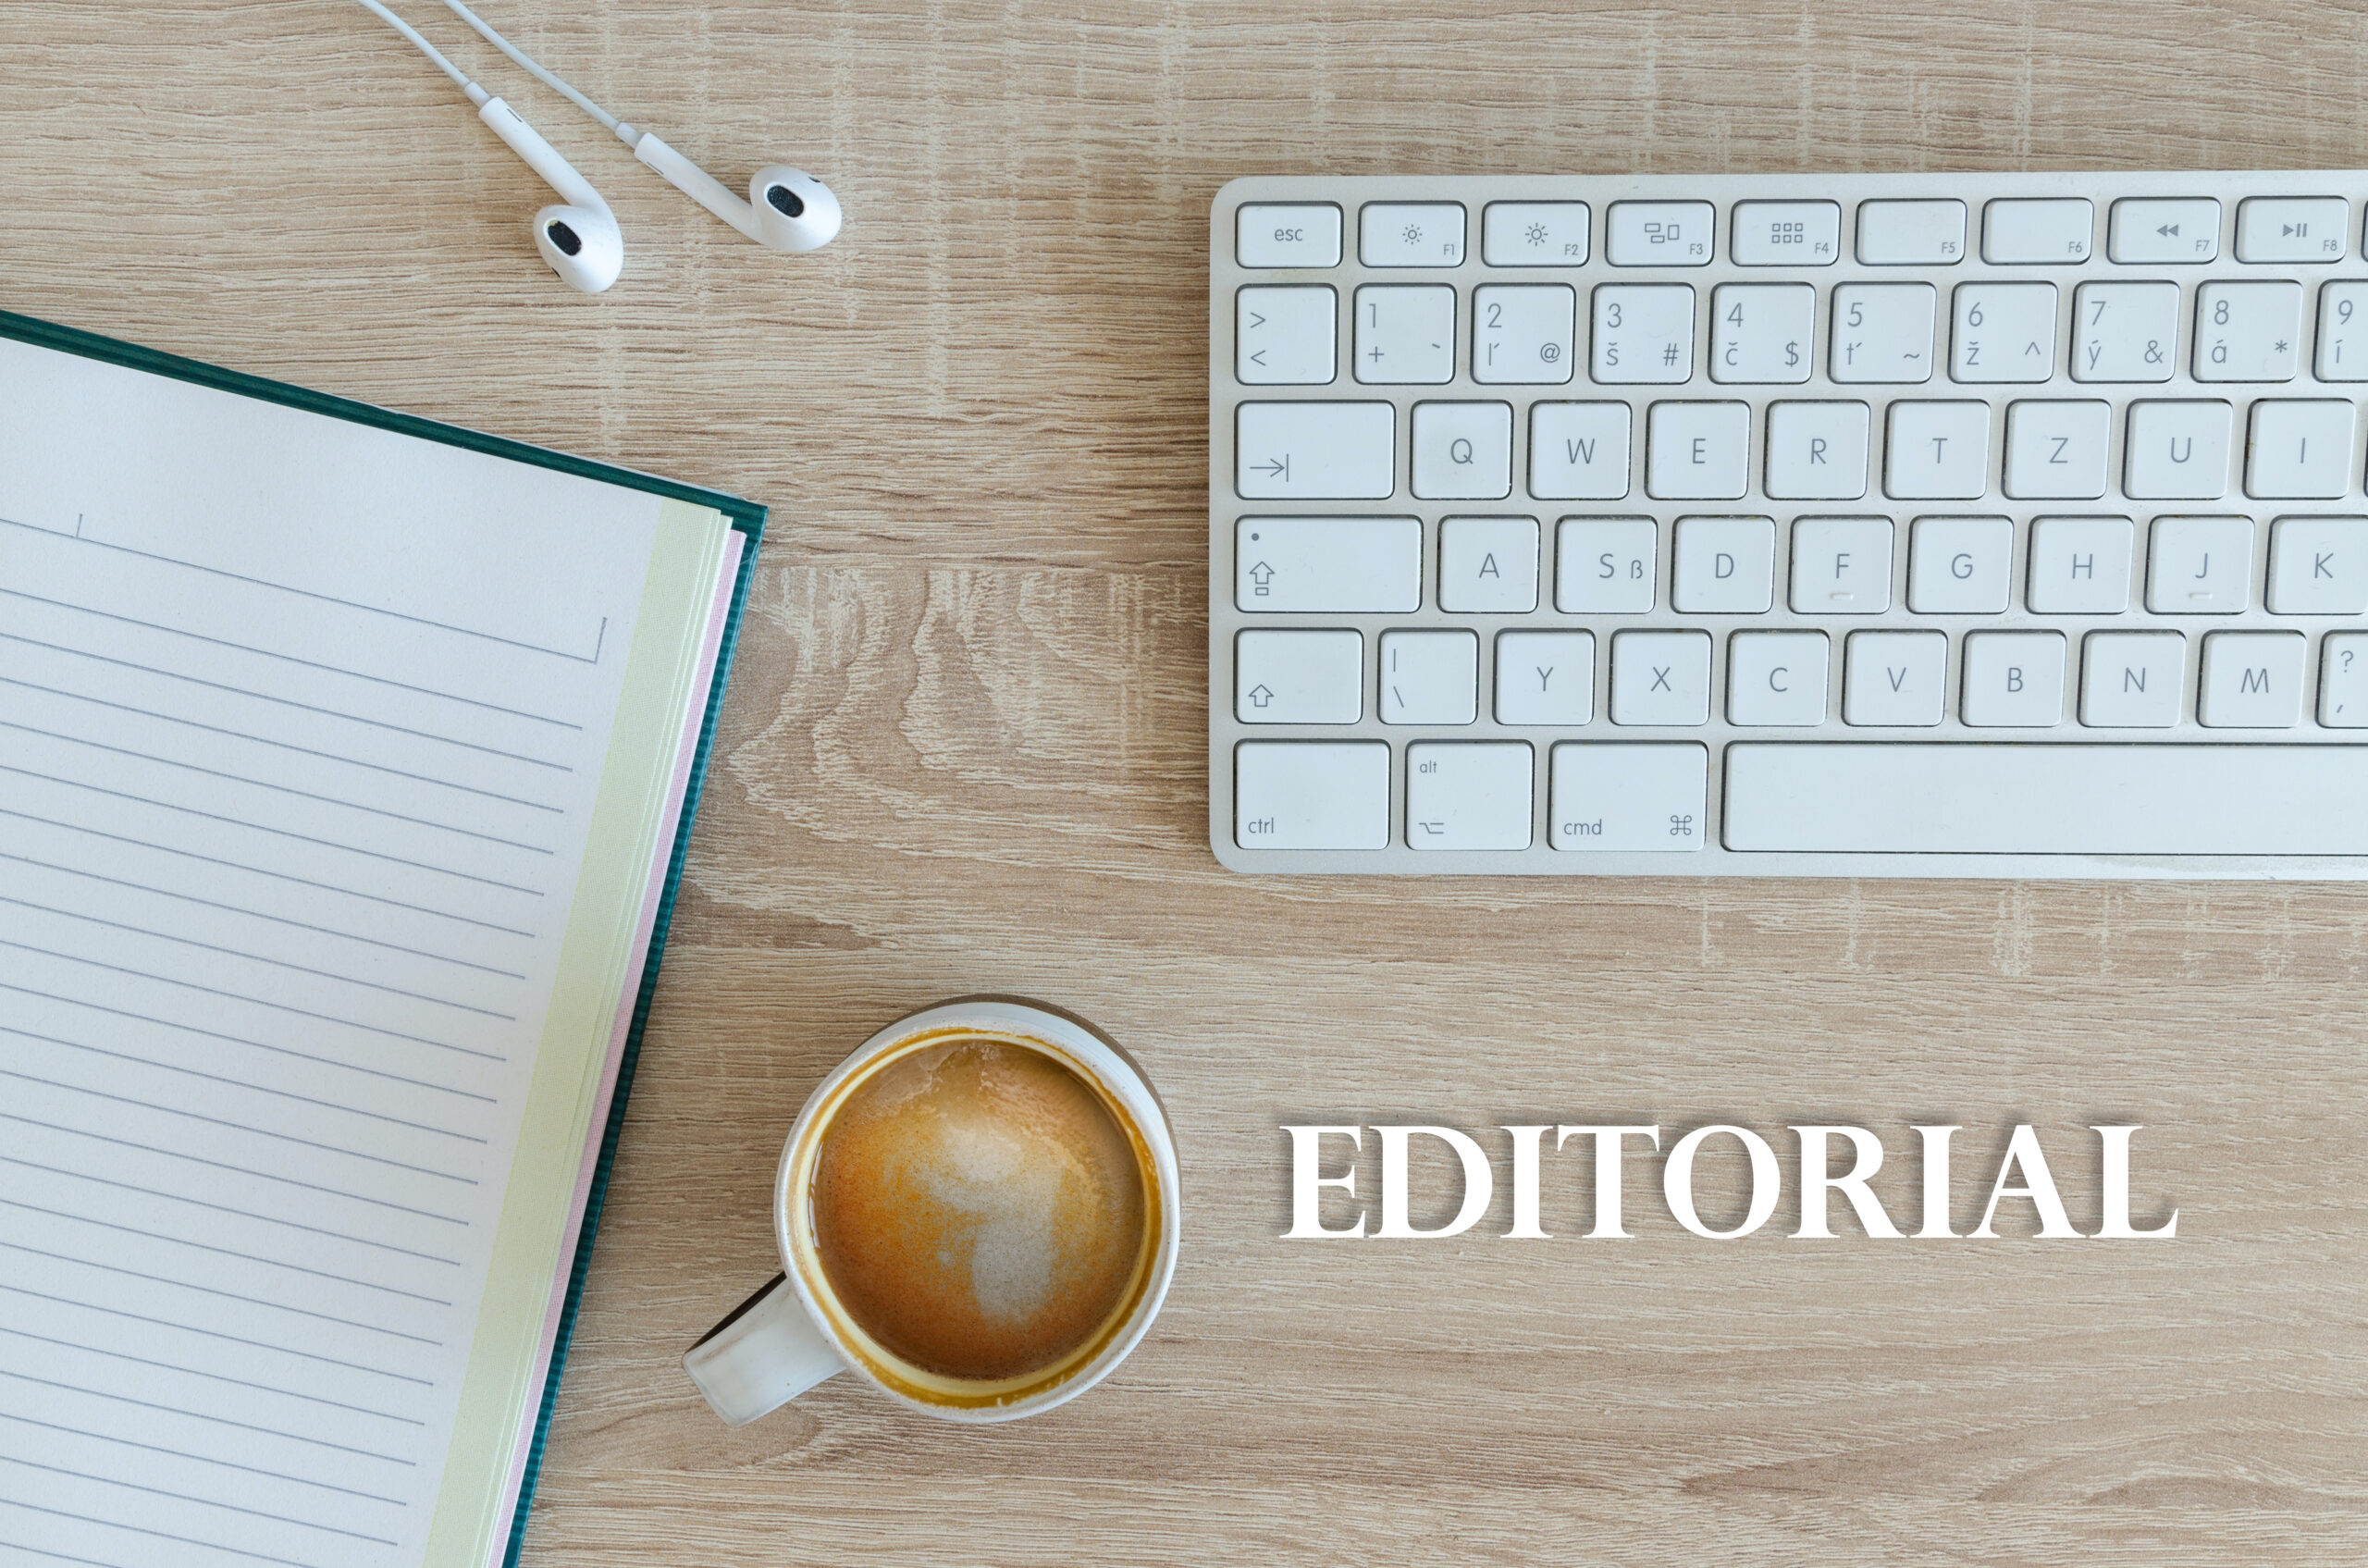 Editorial - top -Up